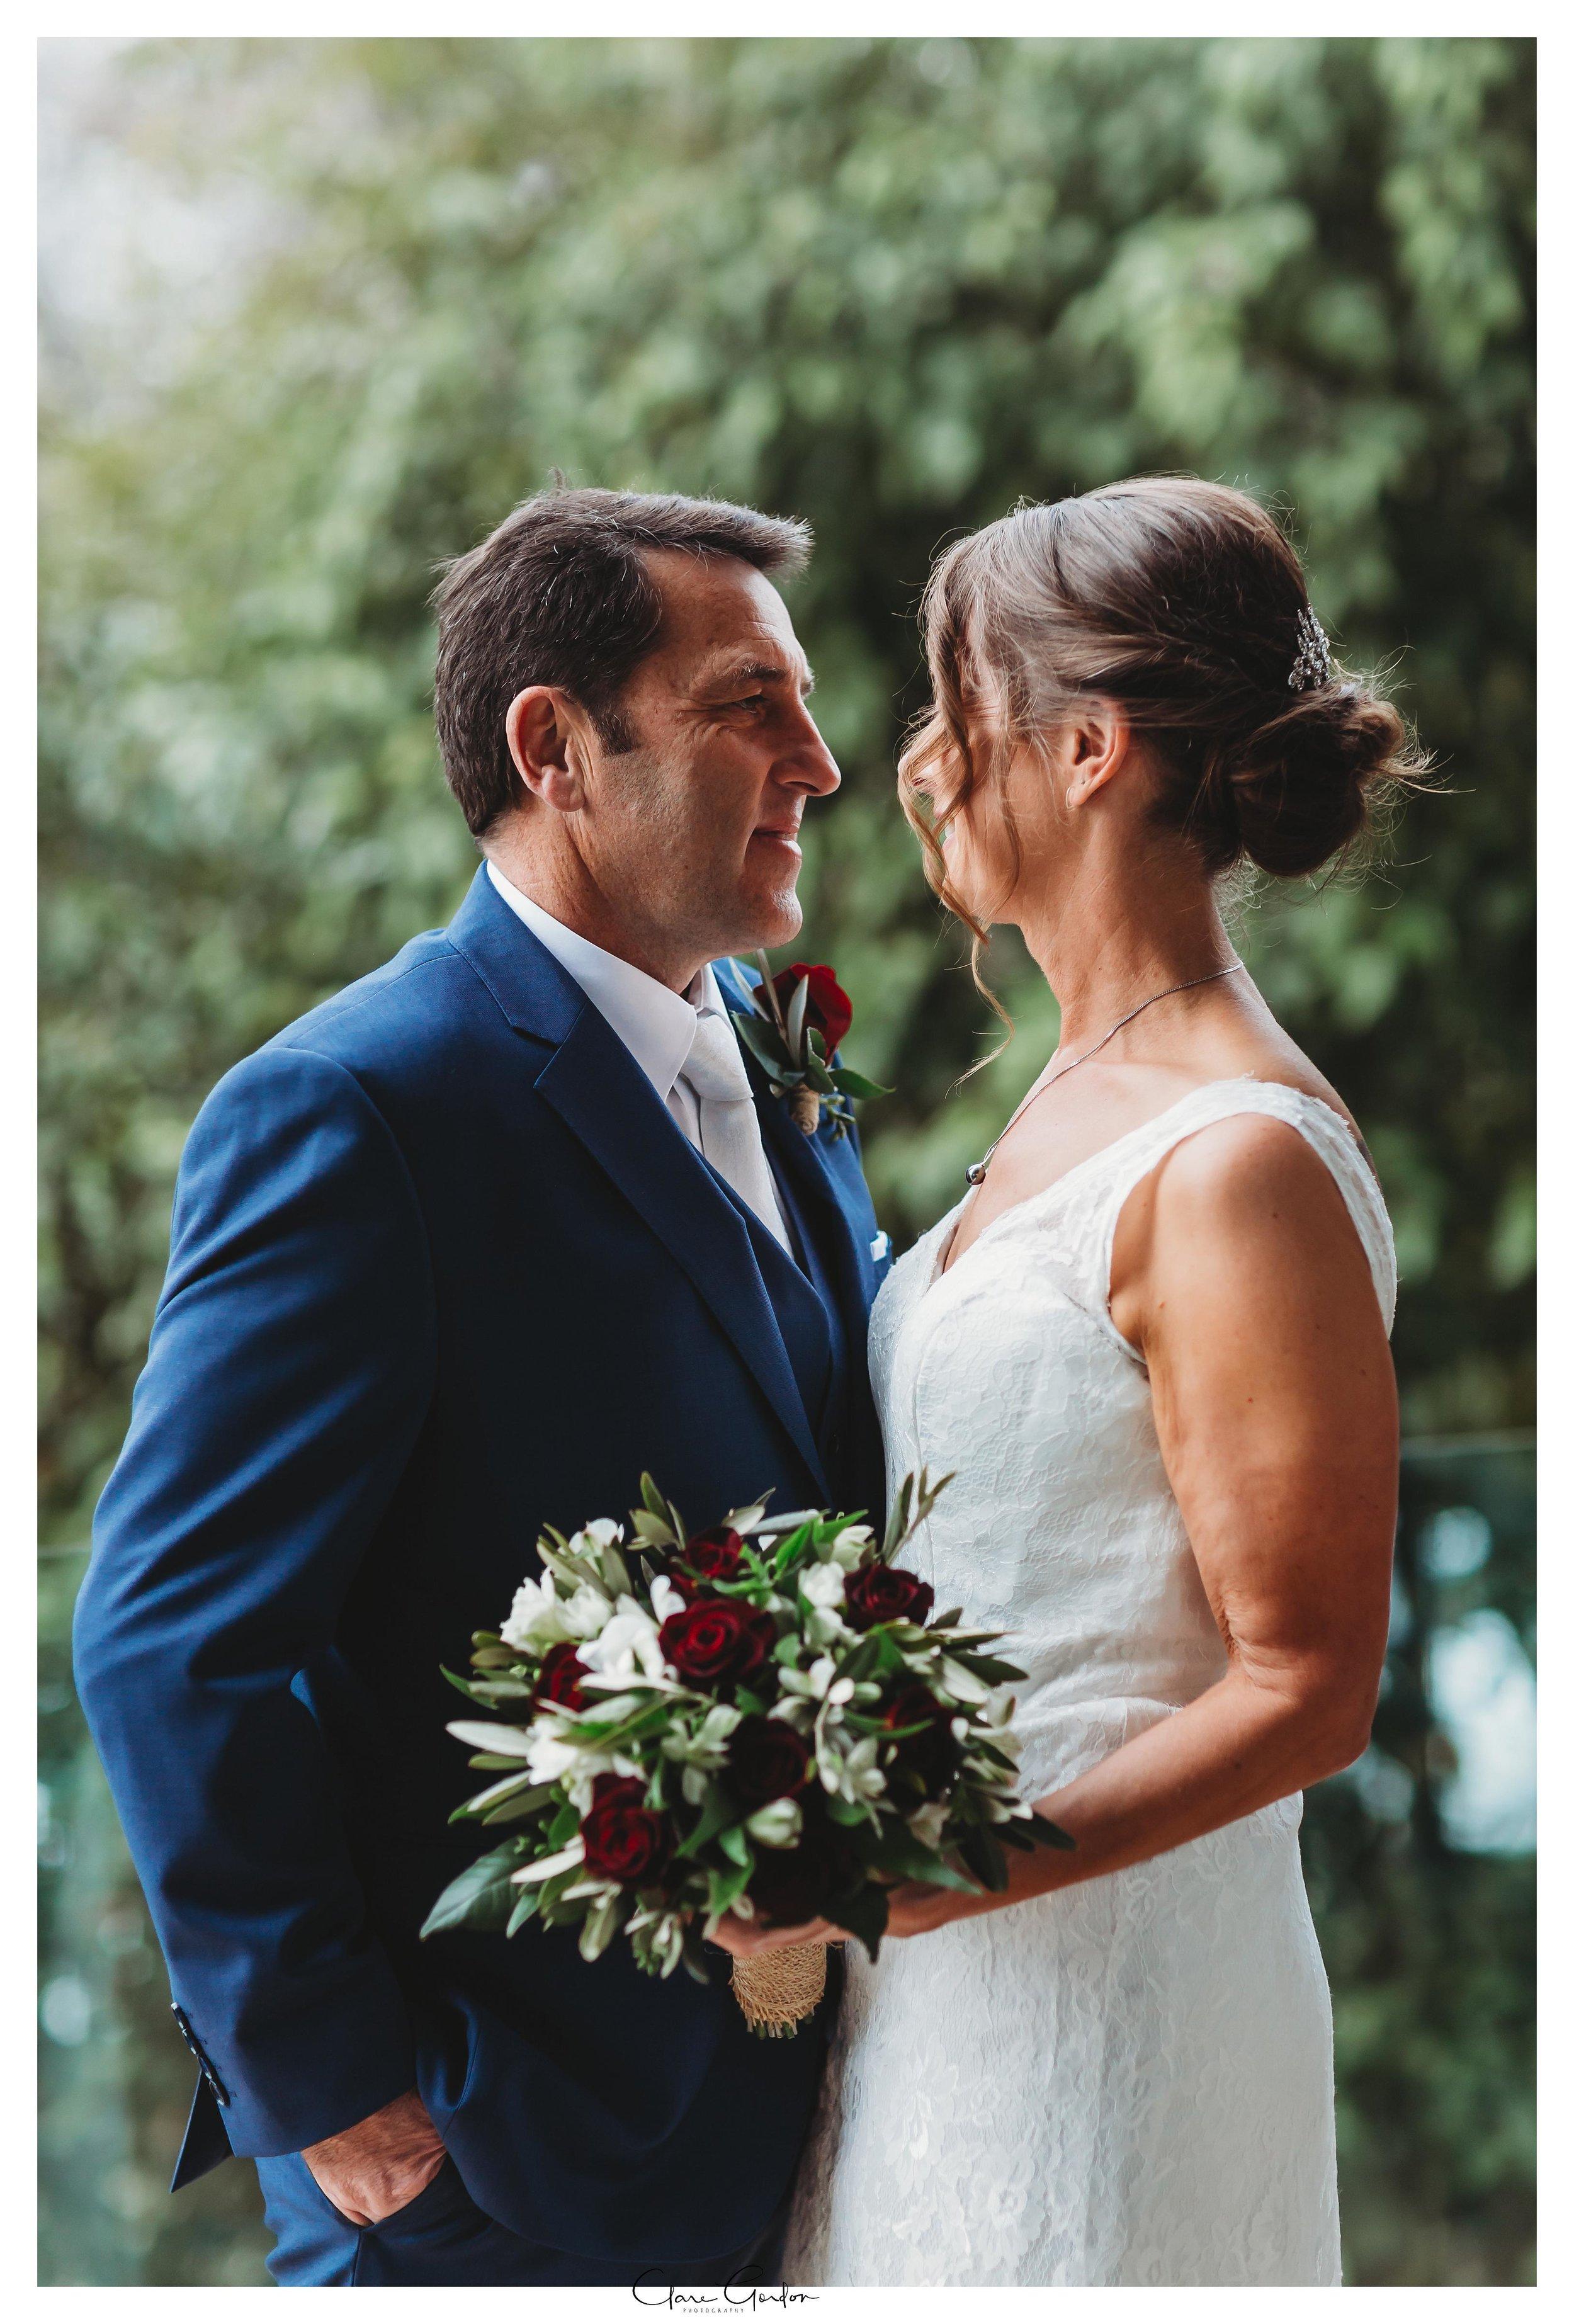 Hamilton-NZ-wedding-photographer-Bride-reflection-Waikato-wedding-photographer-Novotel-Hamilton-Clare-Gordon-photography (20).jpg